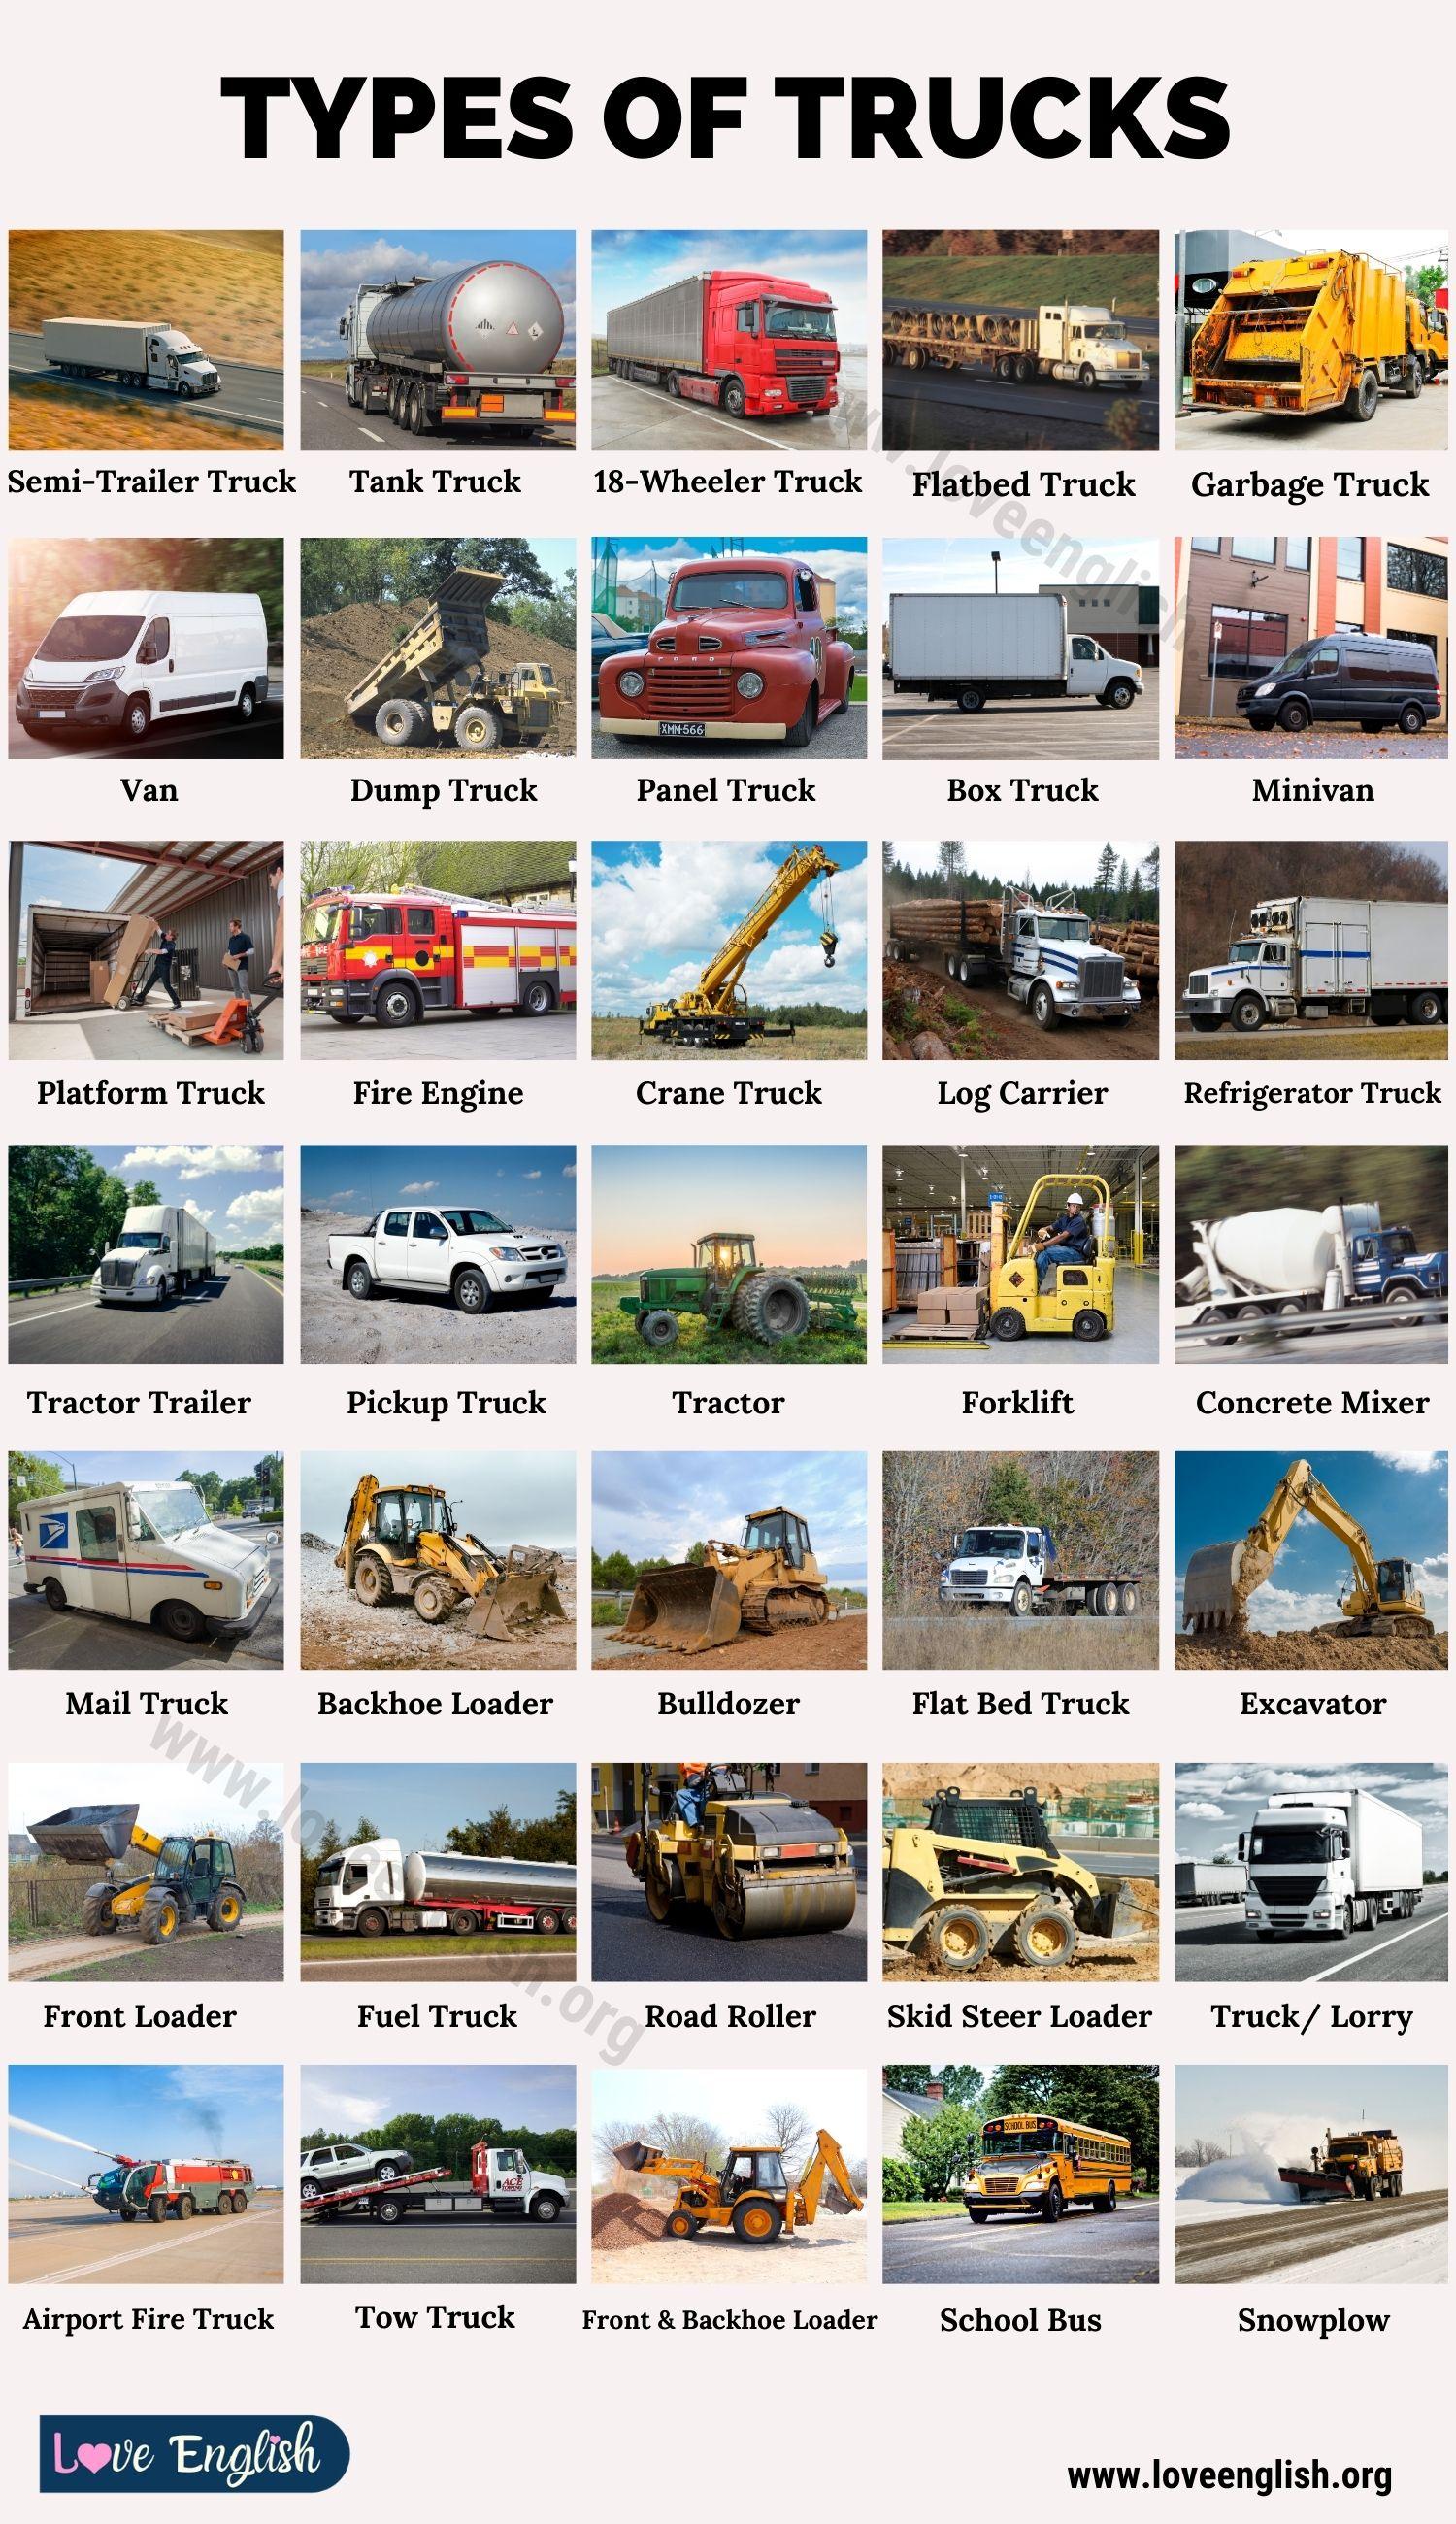 Types of Trucks